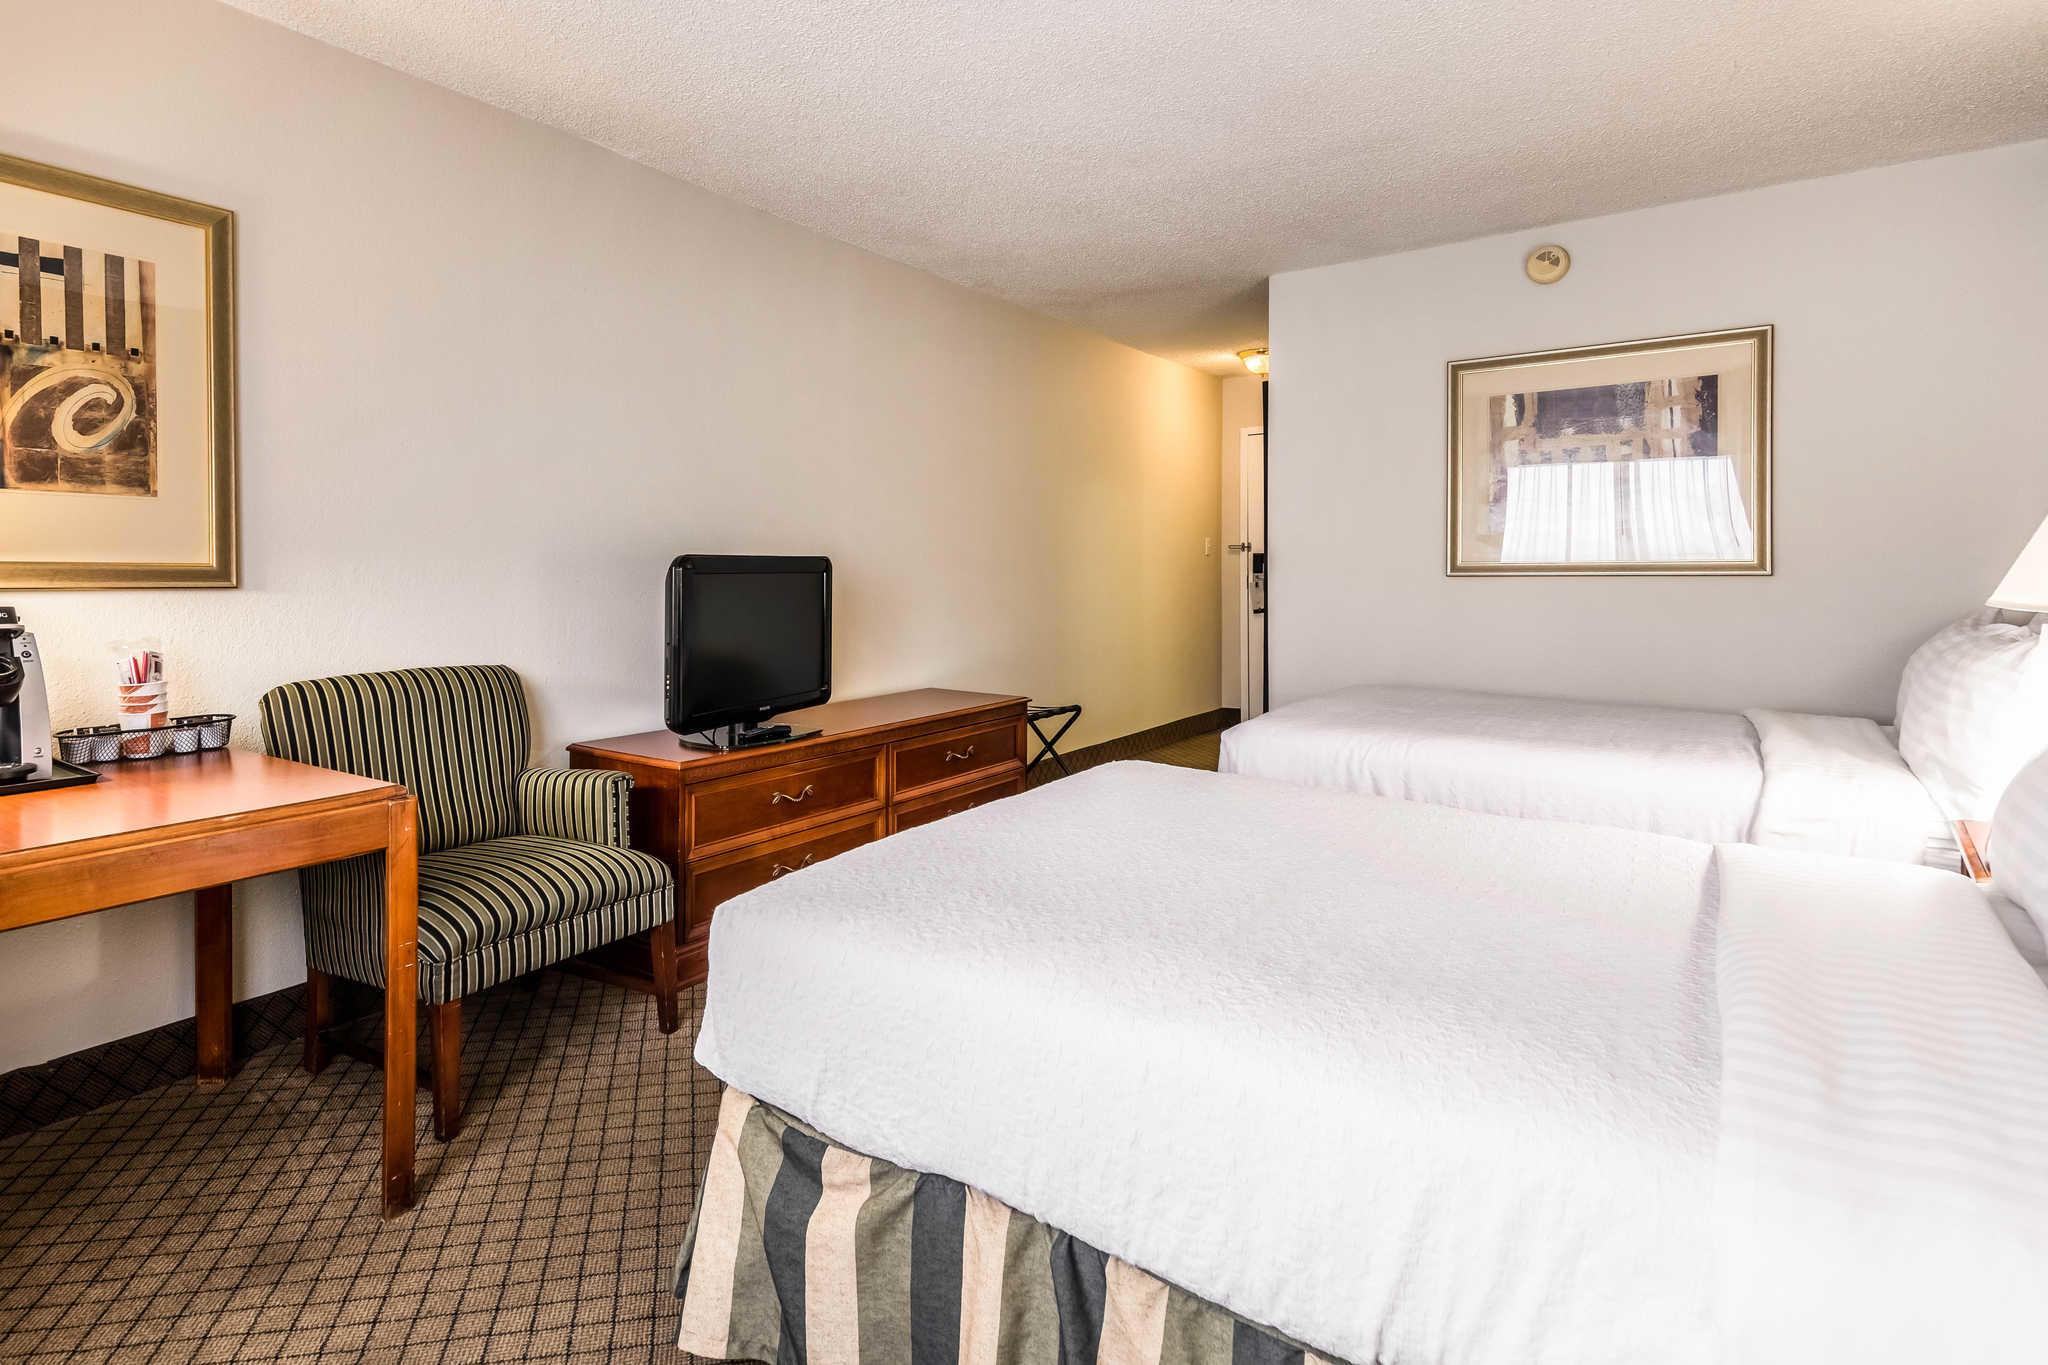 Quality Inn near Finger Lakes and Seneca Falls image 8